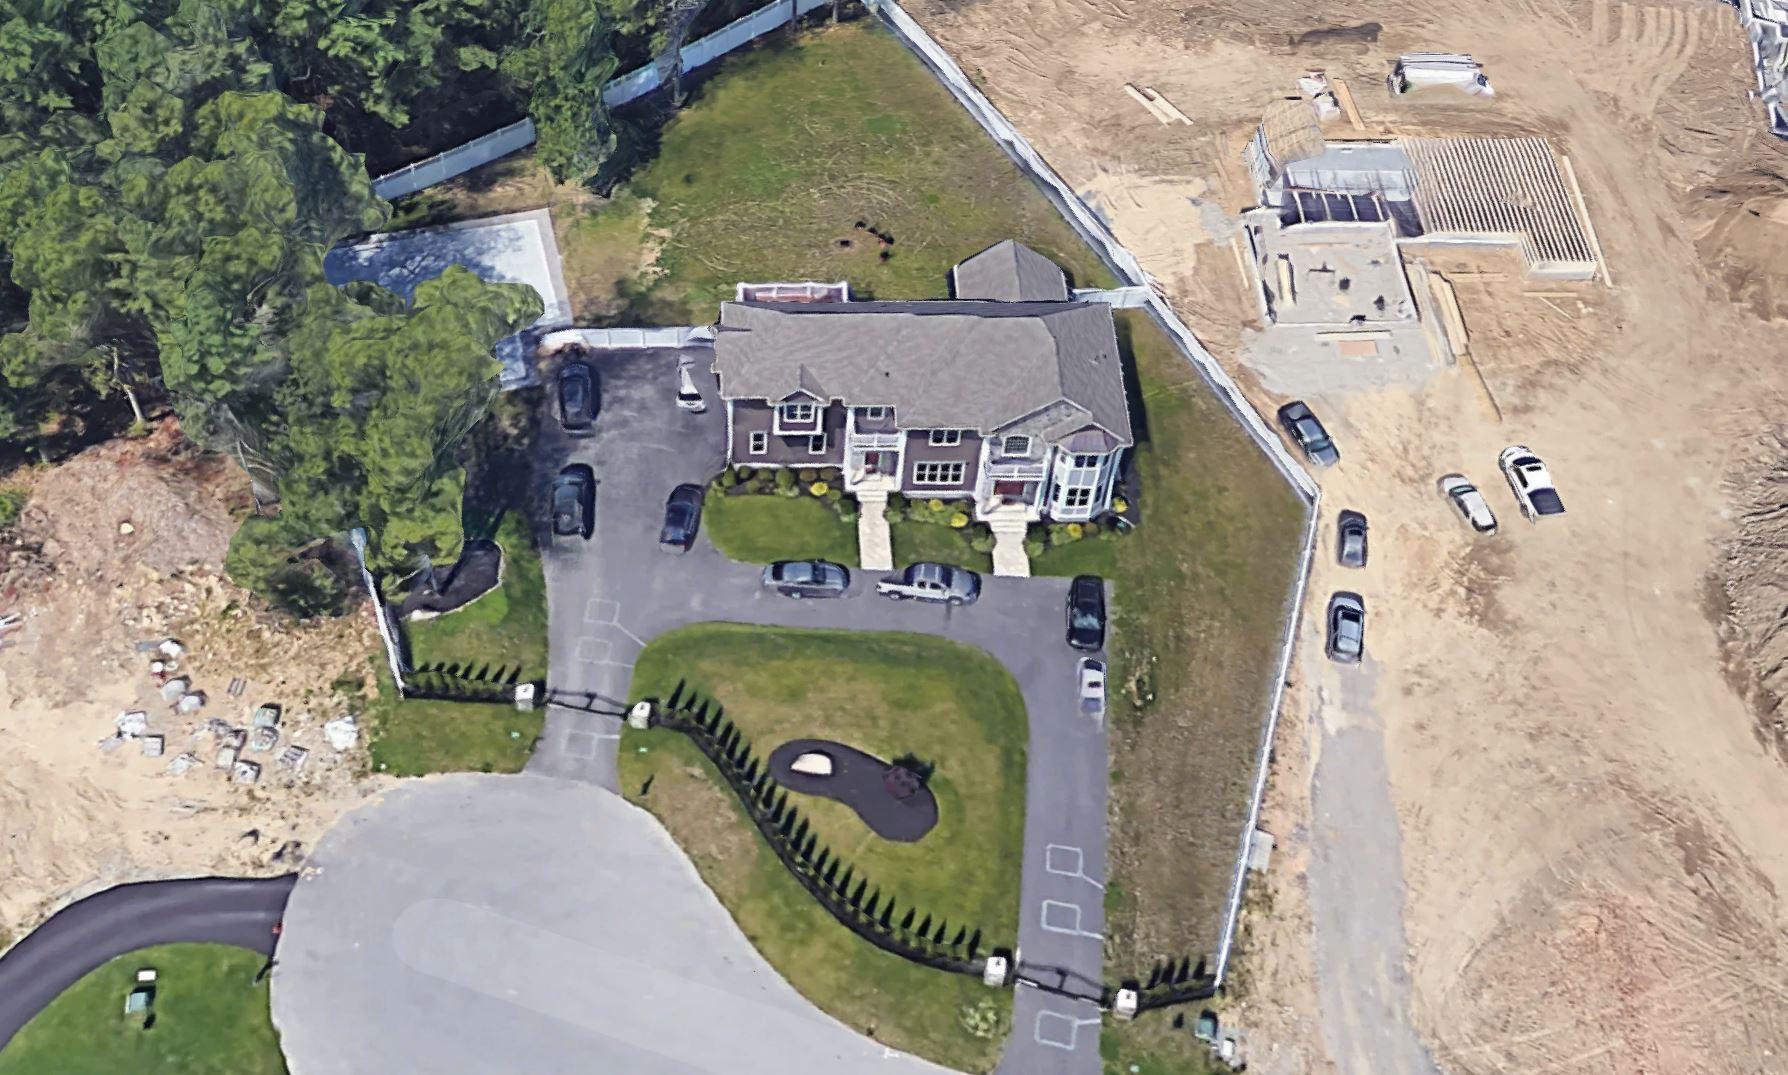 Gronk's house in Foxborough, Massachusetts